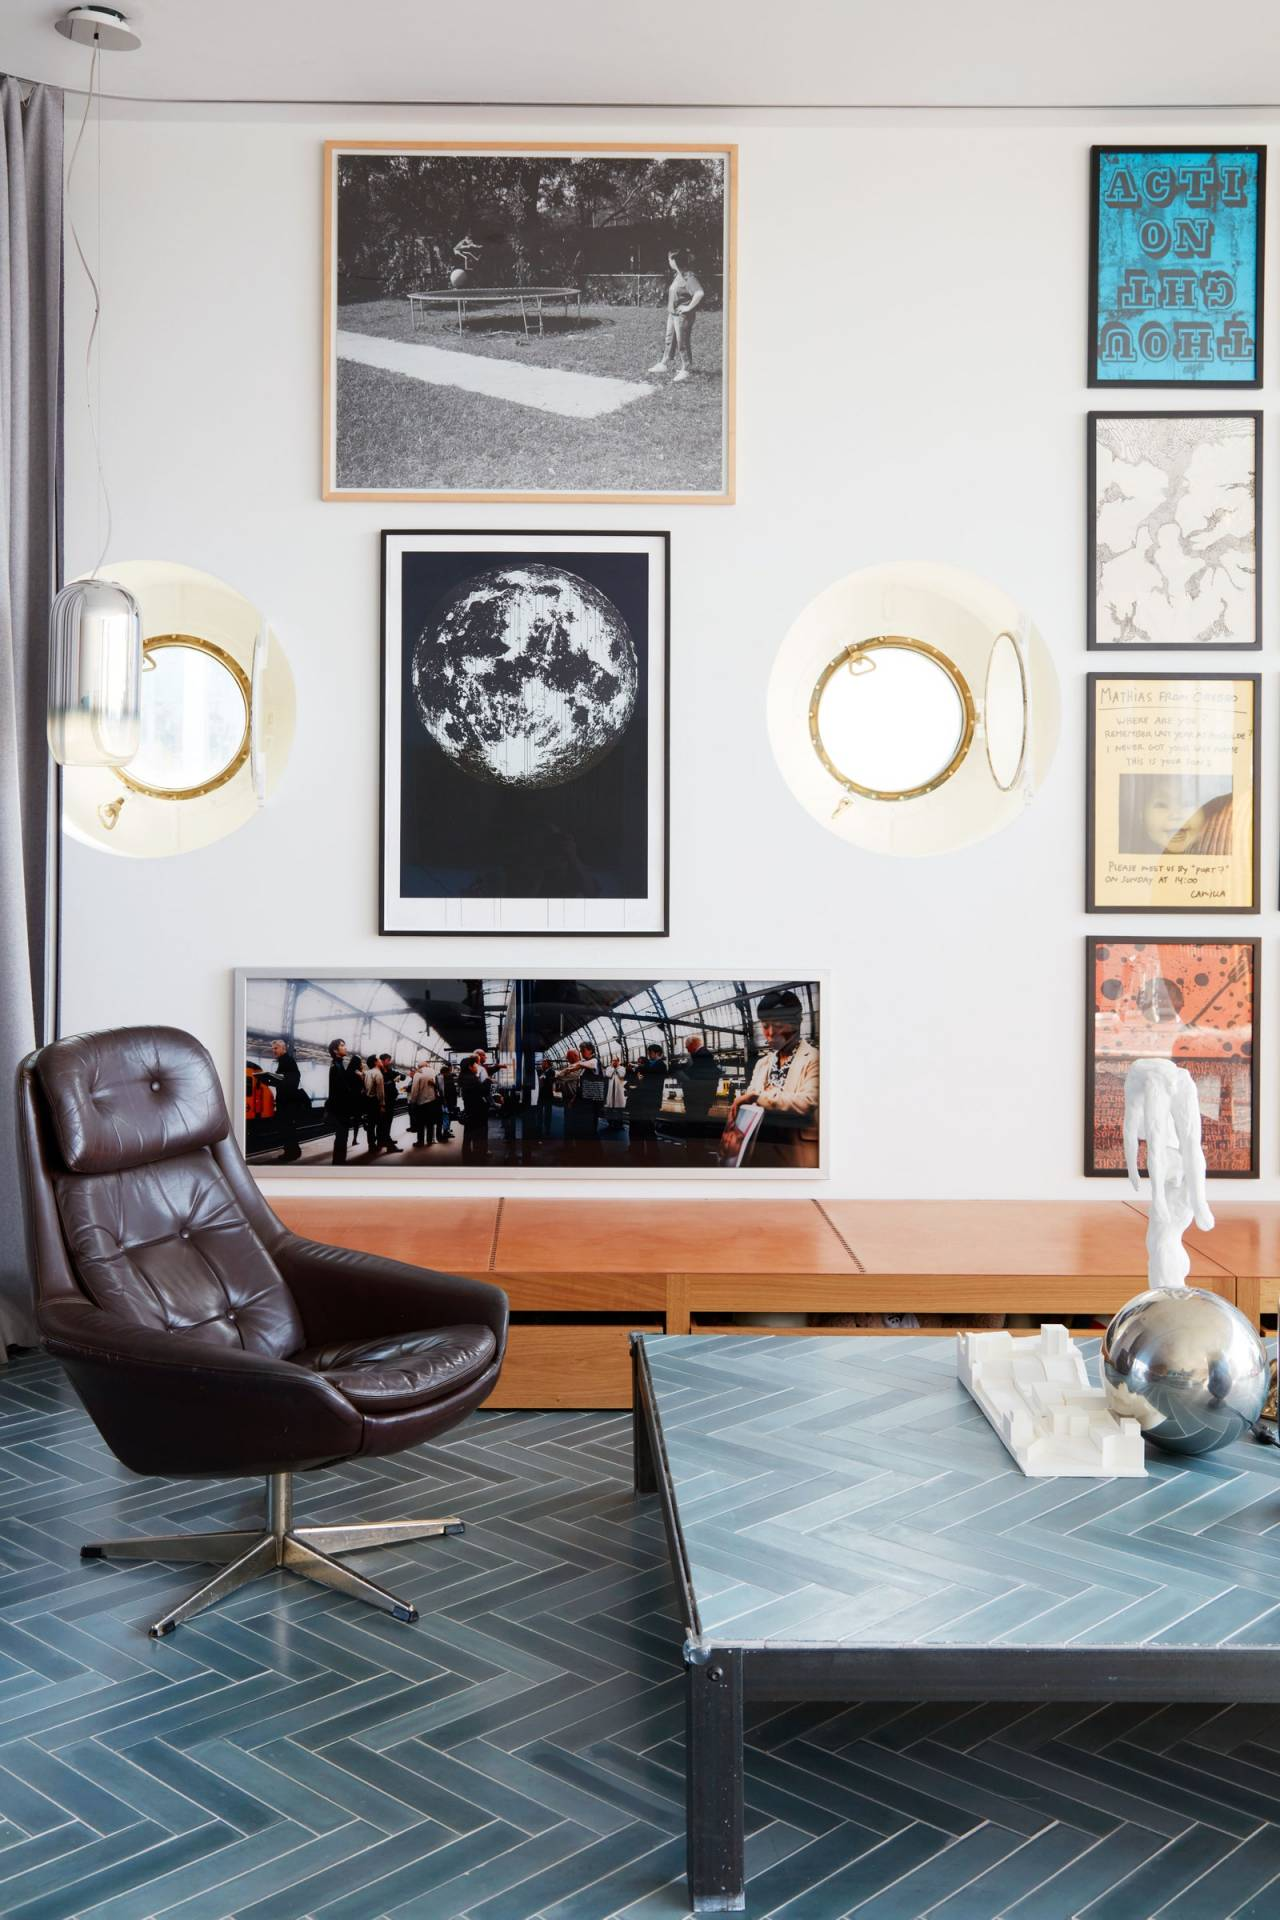 bjarke_ingels_houseboat_foto_pernille_loof_and_thomas_loof_designalive-17